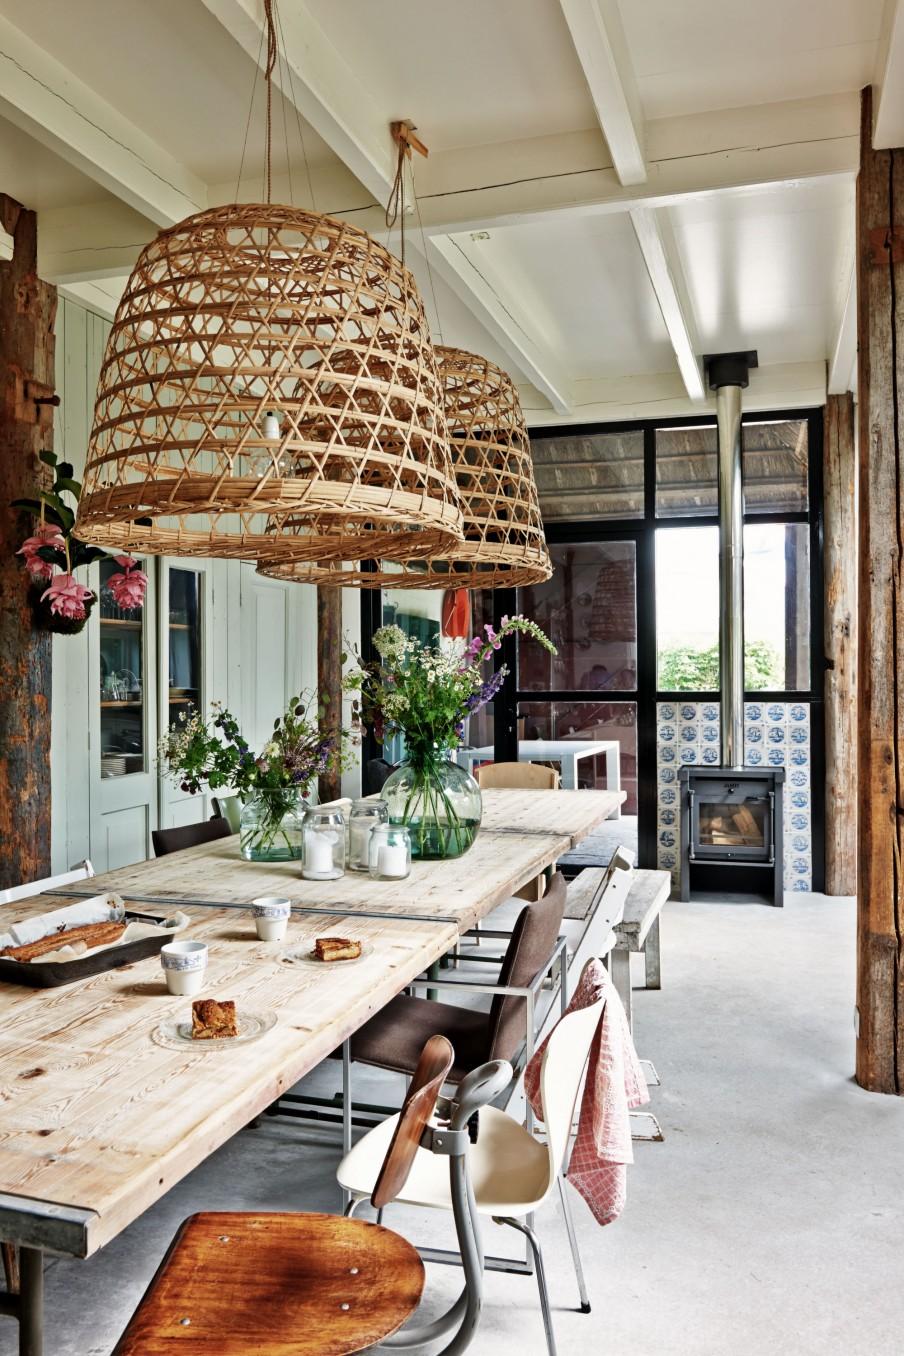 House Envy:  A Renovated Farmhouse inWorkum